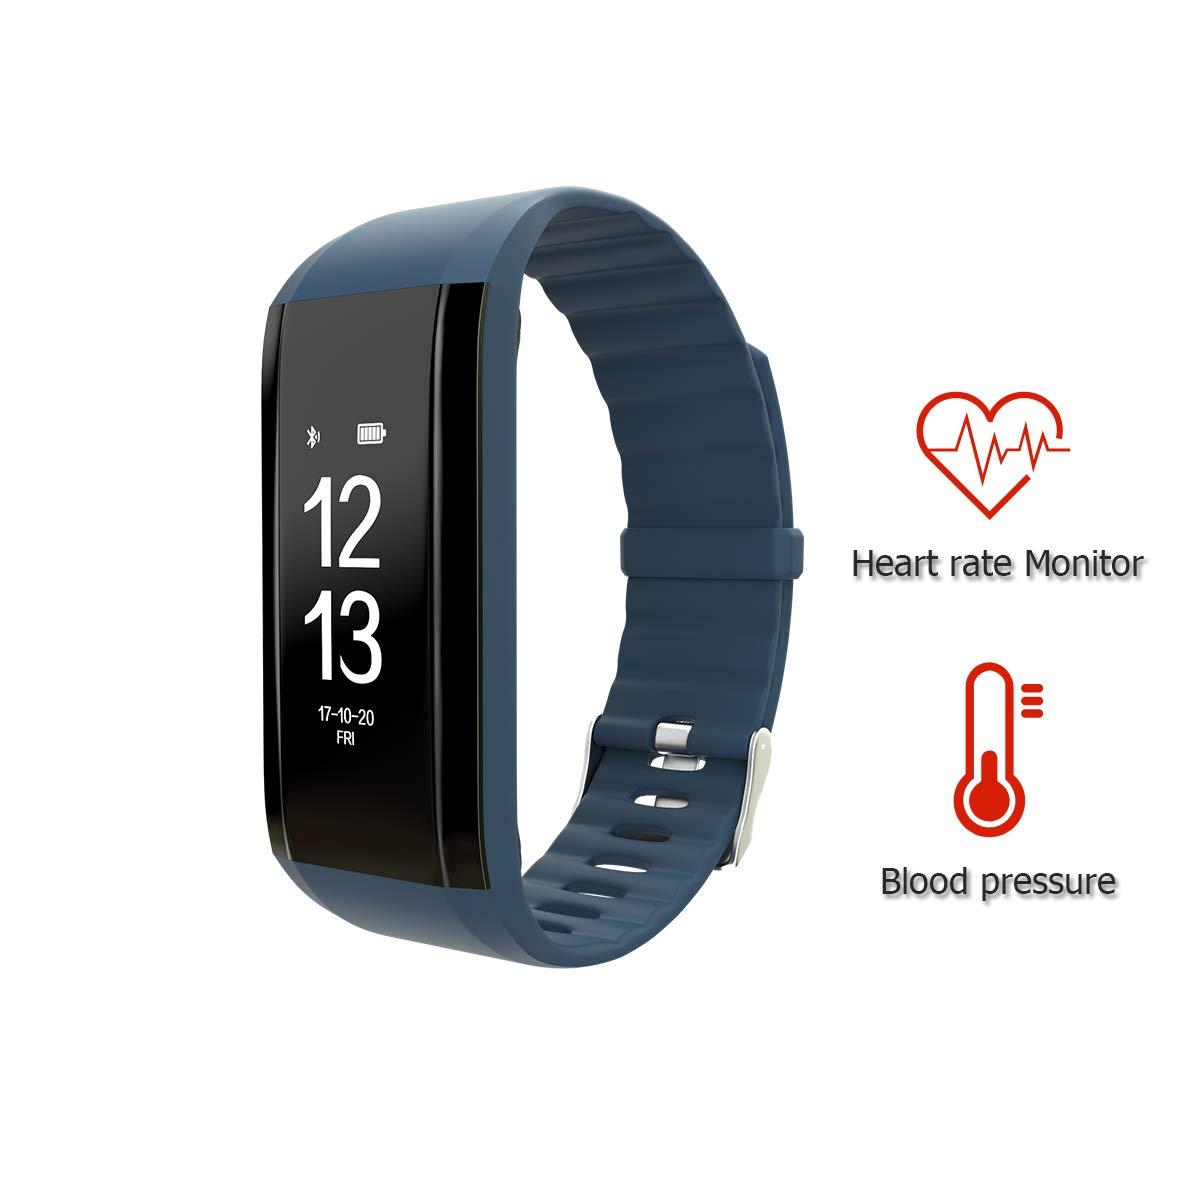 Fitness Tracker,Blood Pressure Heart Rate Monitor Waterproof Smart Bracelet Watch Pedometers Sport Gadgets Health Tracker for Kids Teens Men Women Boys and Girls(Blue)